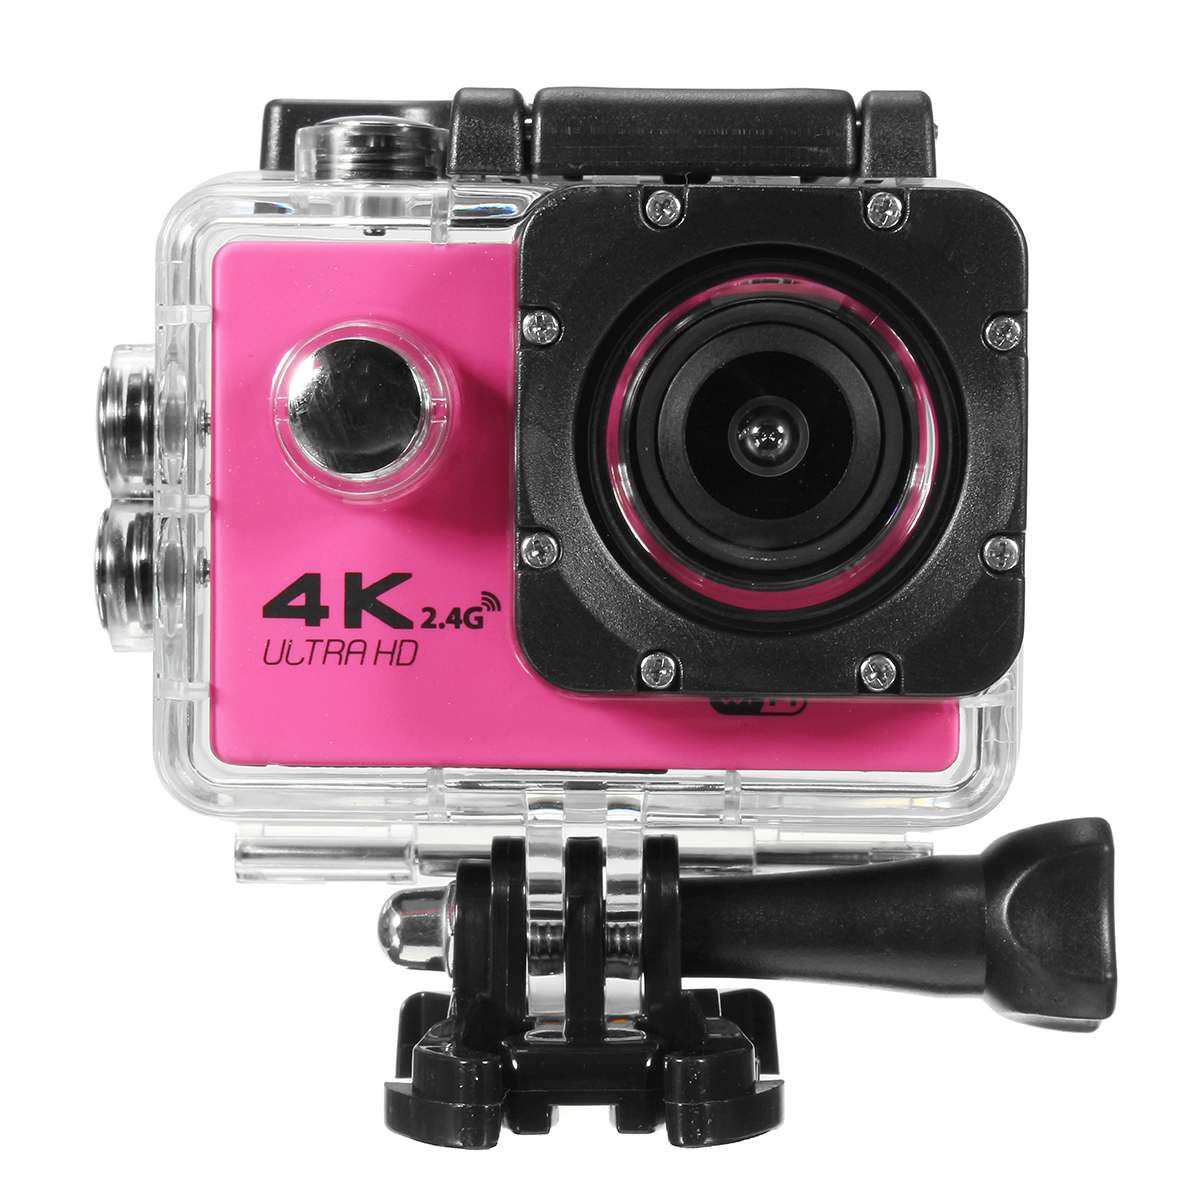 Caméra d'action multicolore F60R Ultra HD 4 K/30fps WiFi 2.0